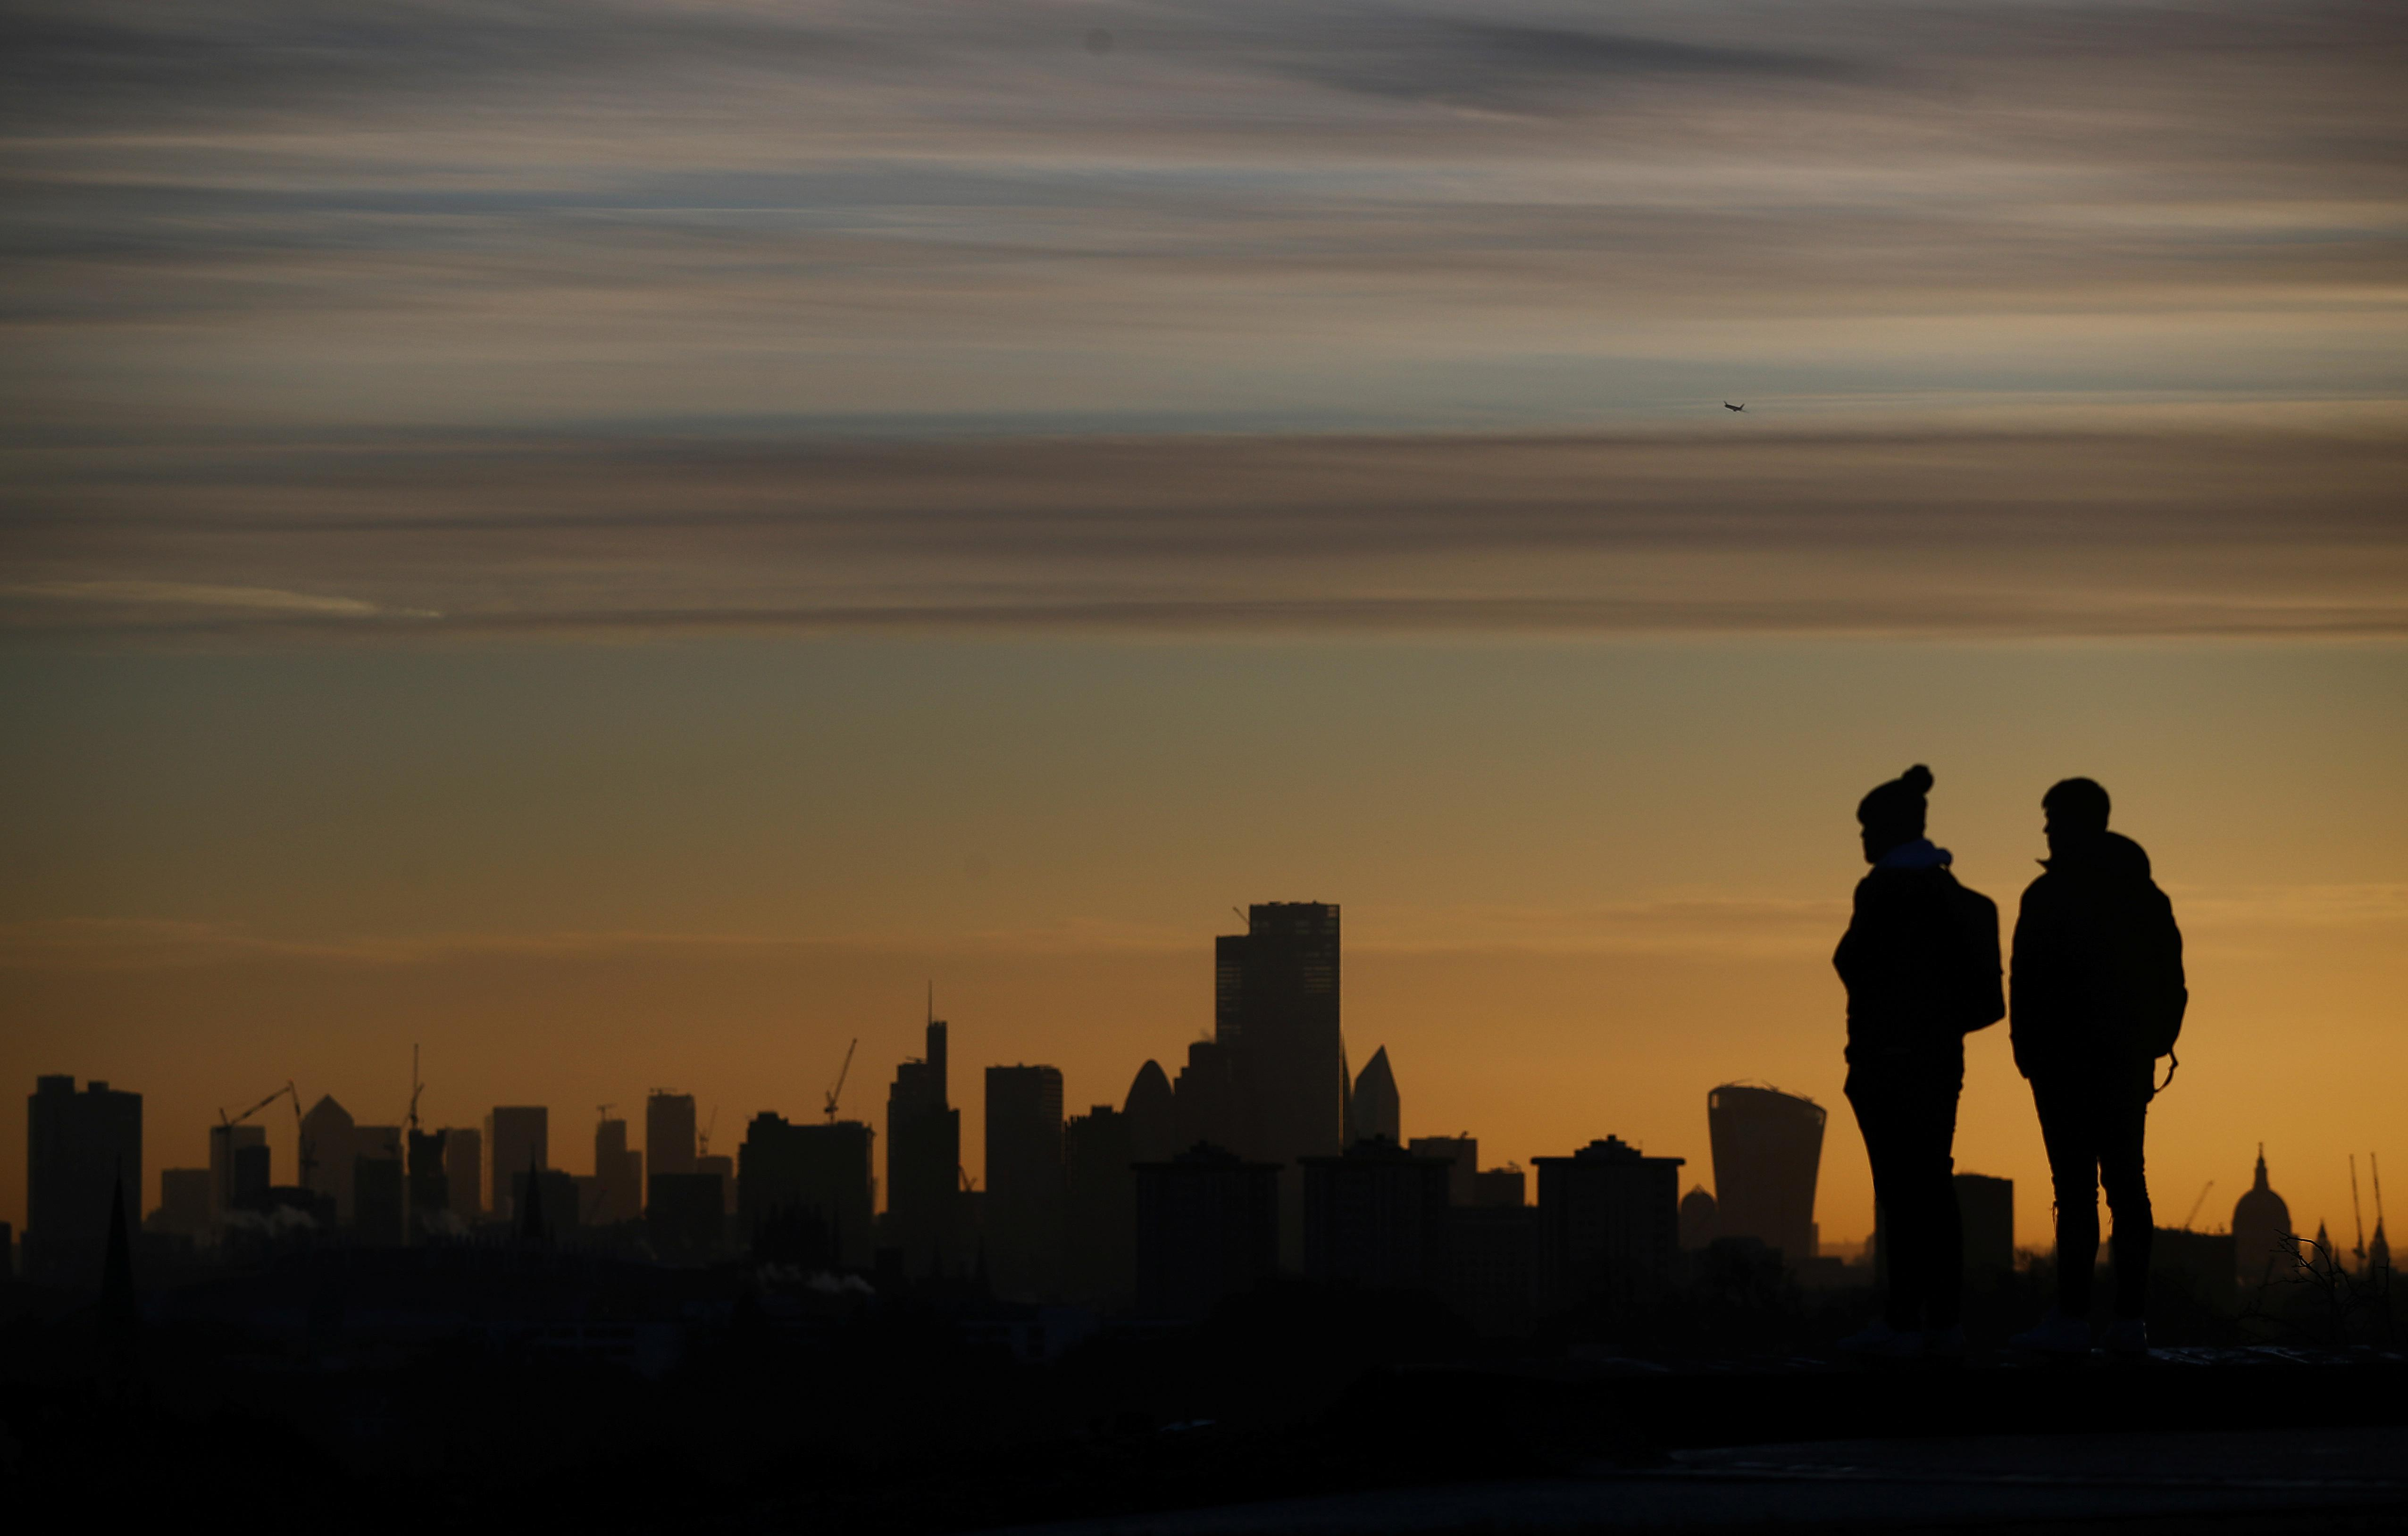 City optimistic about future despite hiring slump